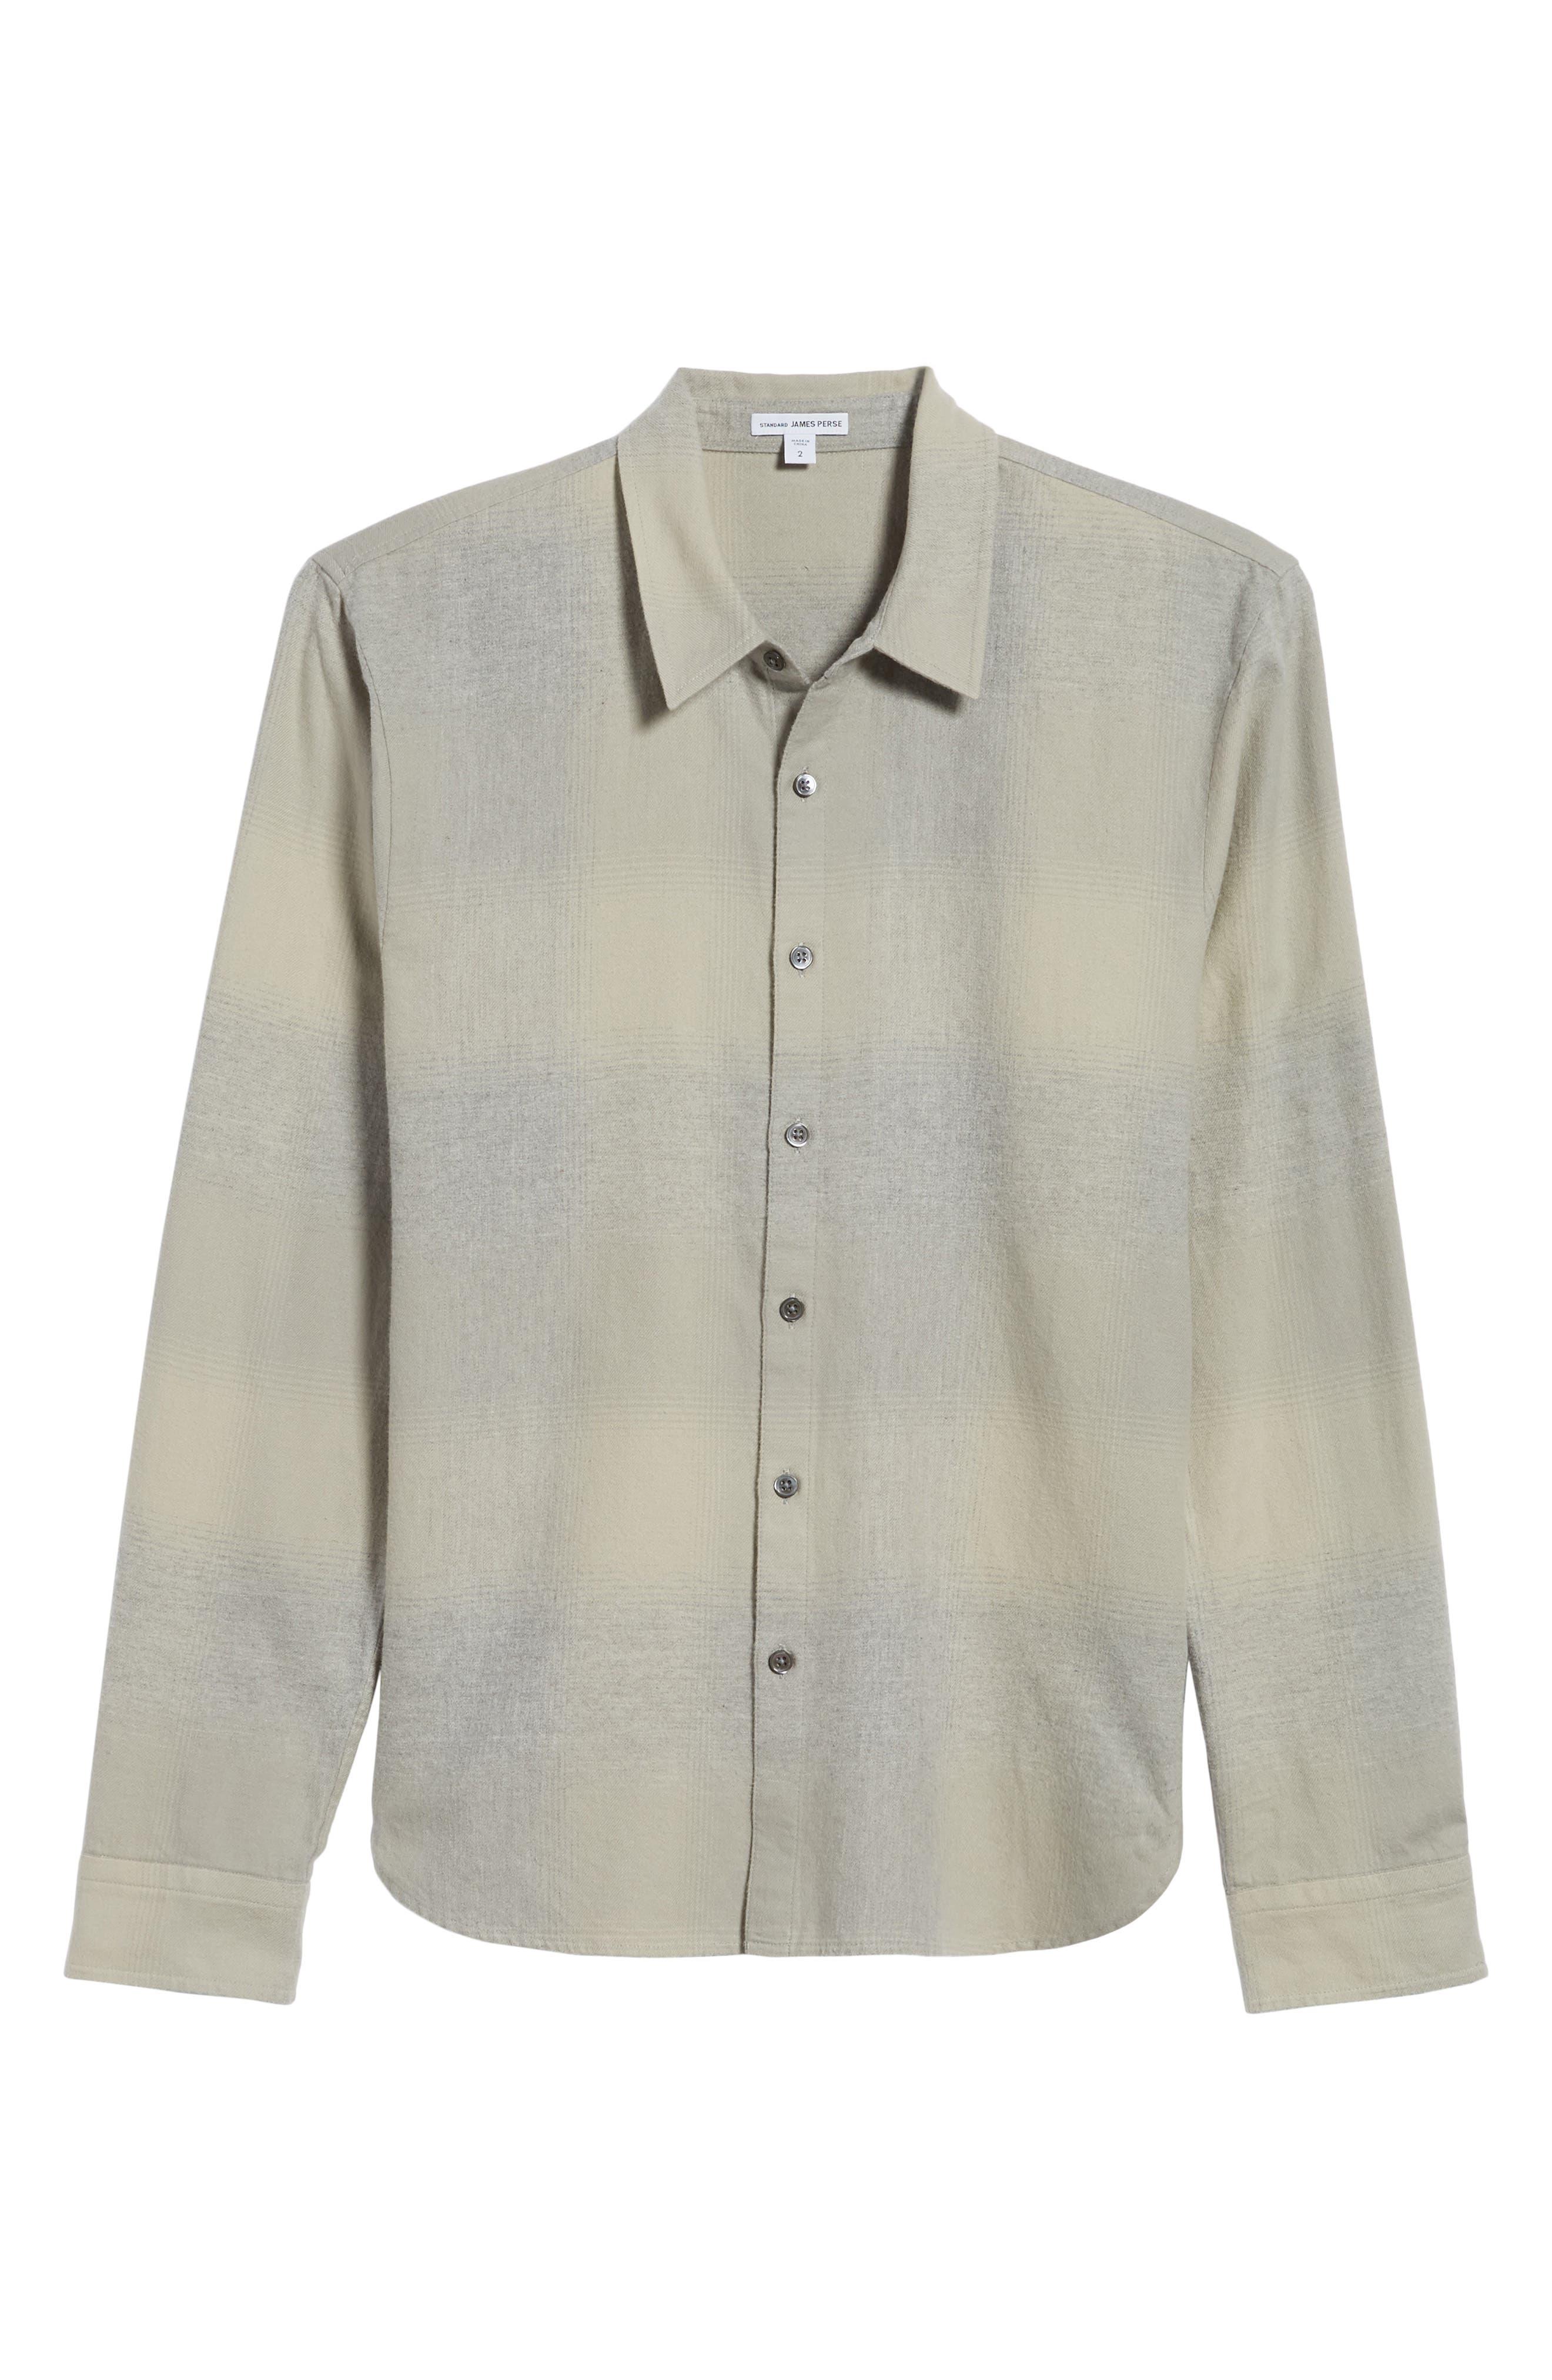 JAMES PERSE,                             Ghost Regular Fit Plaid Sport Shirt,                             Alternate thumbnail 6, color,                             086